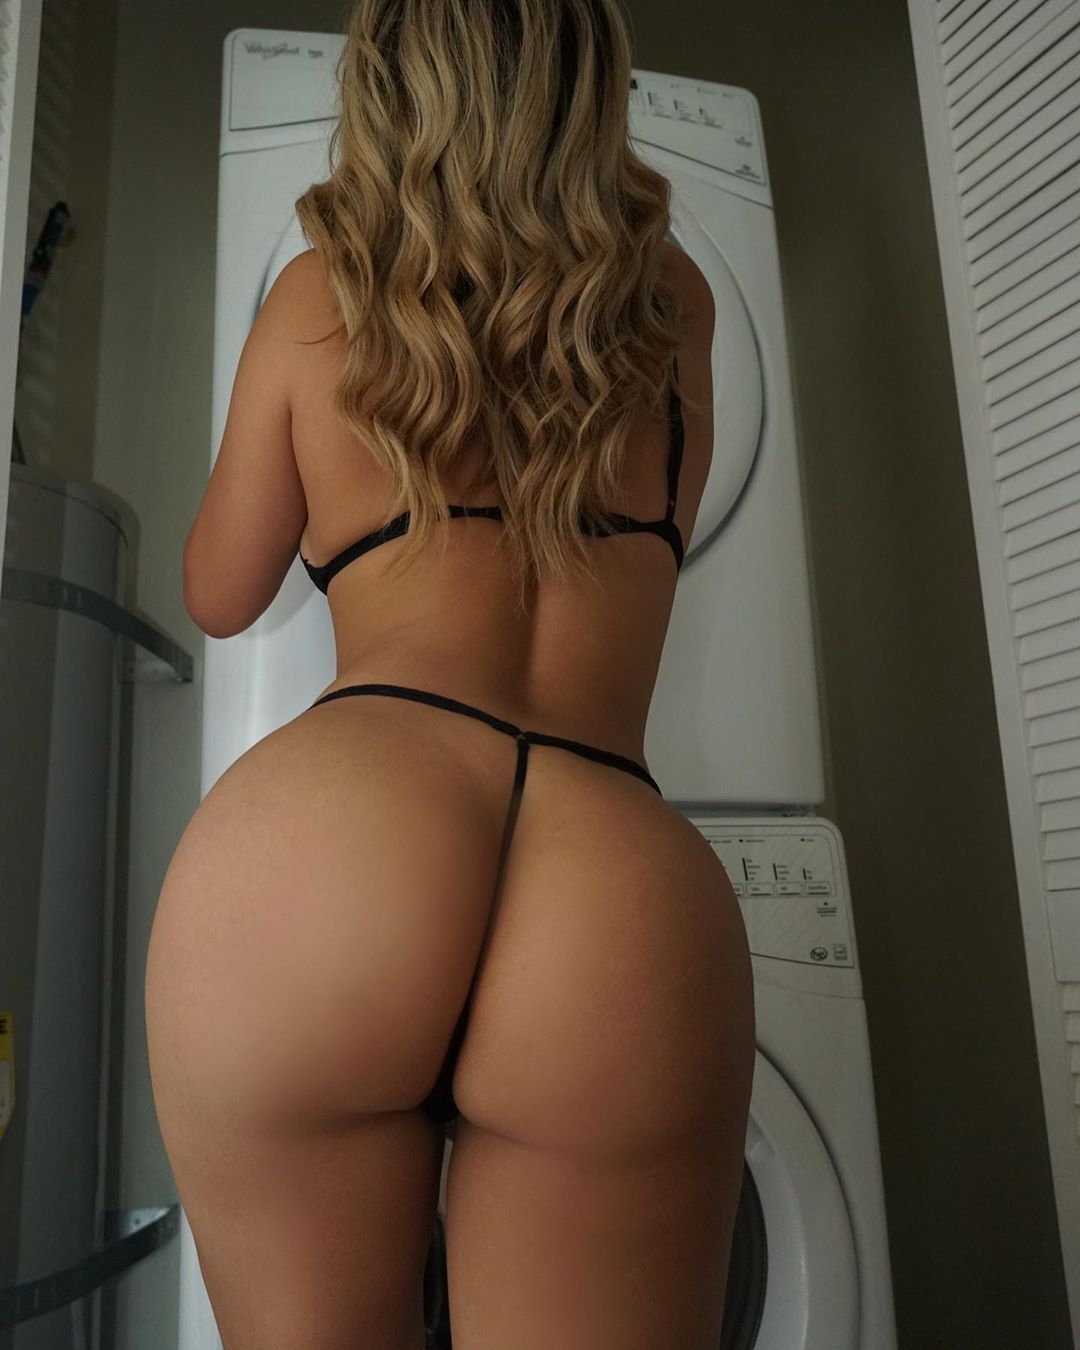 The Chantal Mia (OnlyFans), imagenes de chicas sexo en onlyfans.